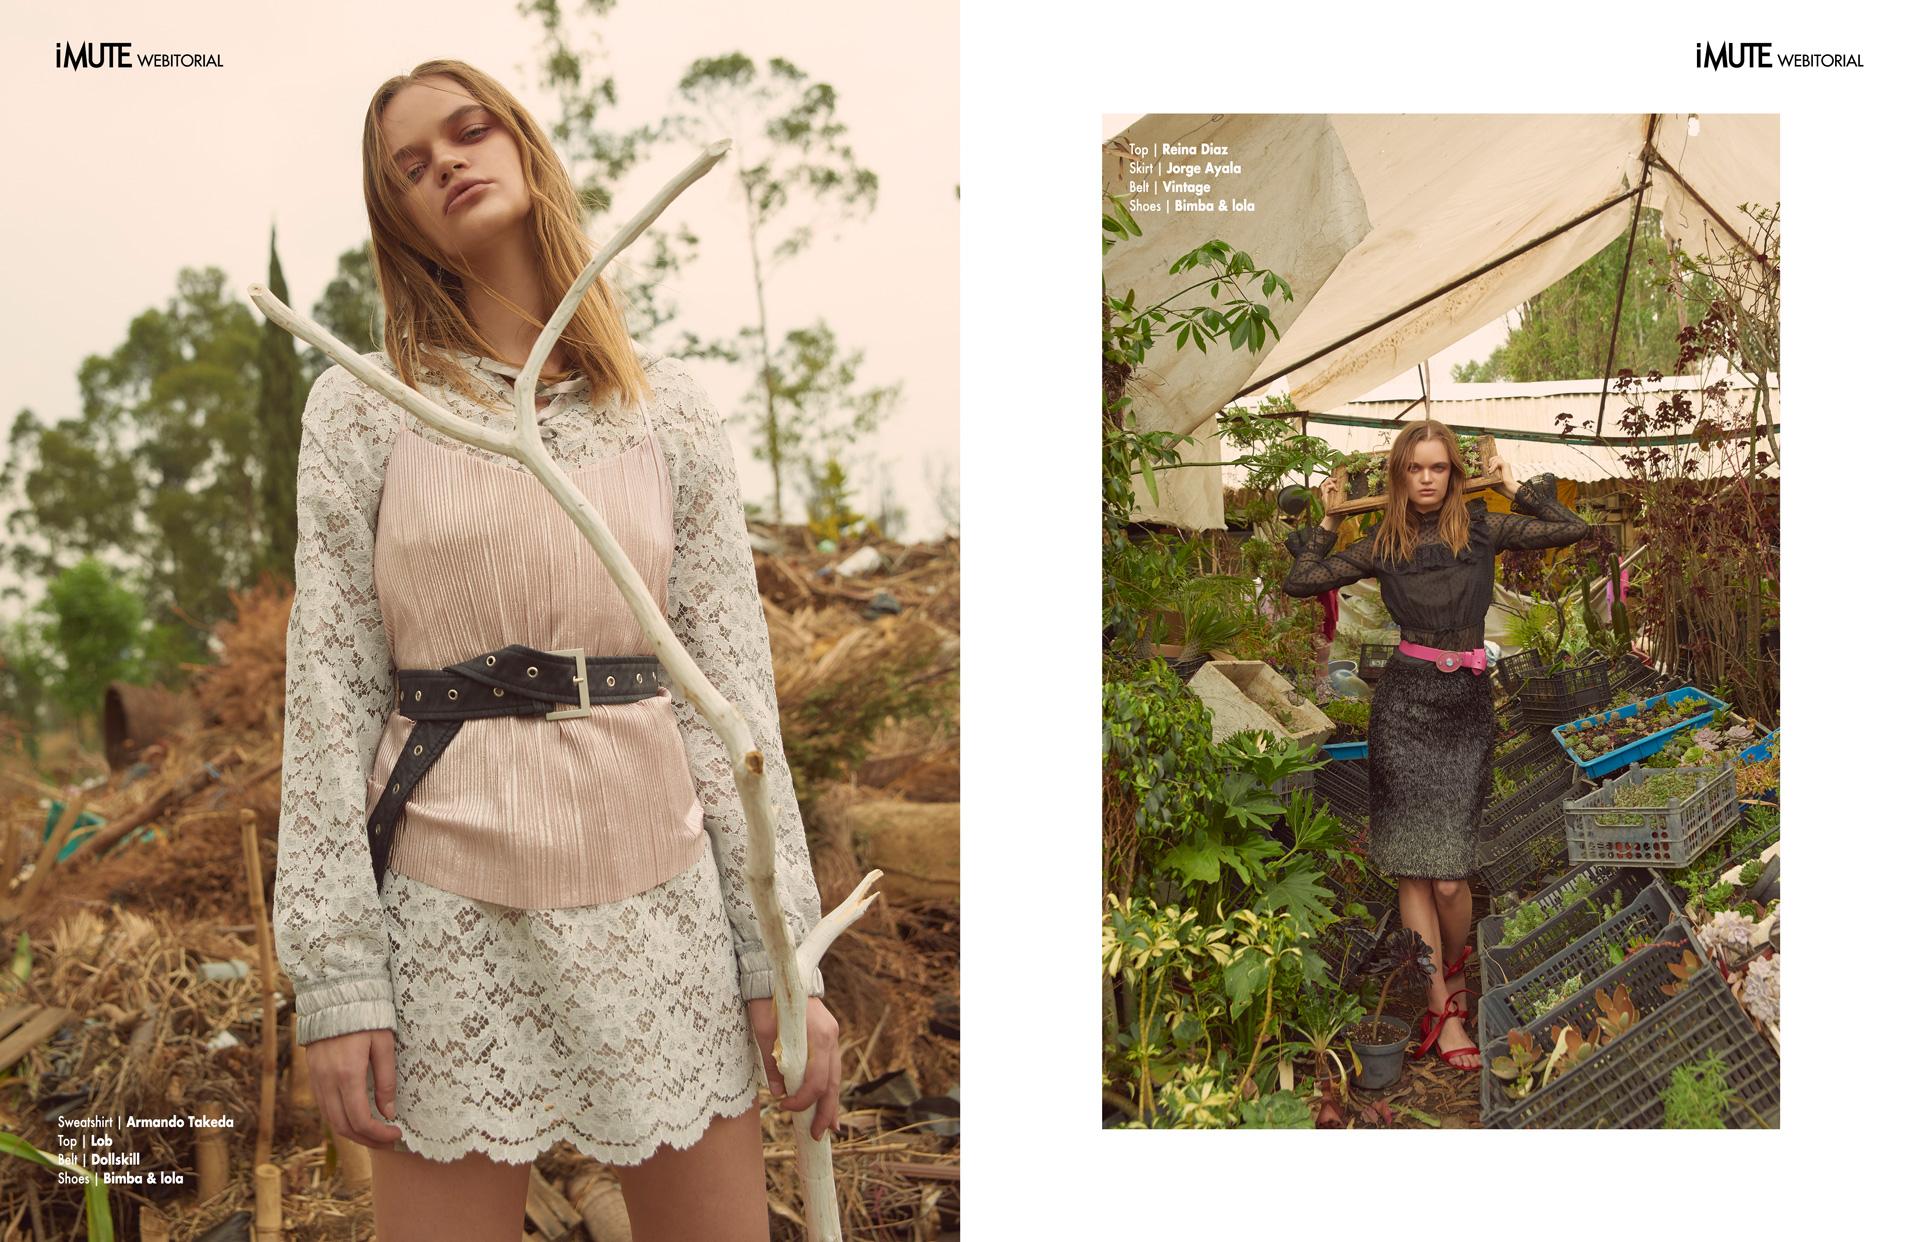 Greenhouse effect webitorial for iMute Magazine Photographer | Ramon Arana Model | Olga Zi @ New Icon Model Management Stylist | Diego Ibañez Makeup | Jesus Palencia